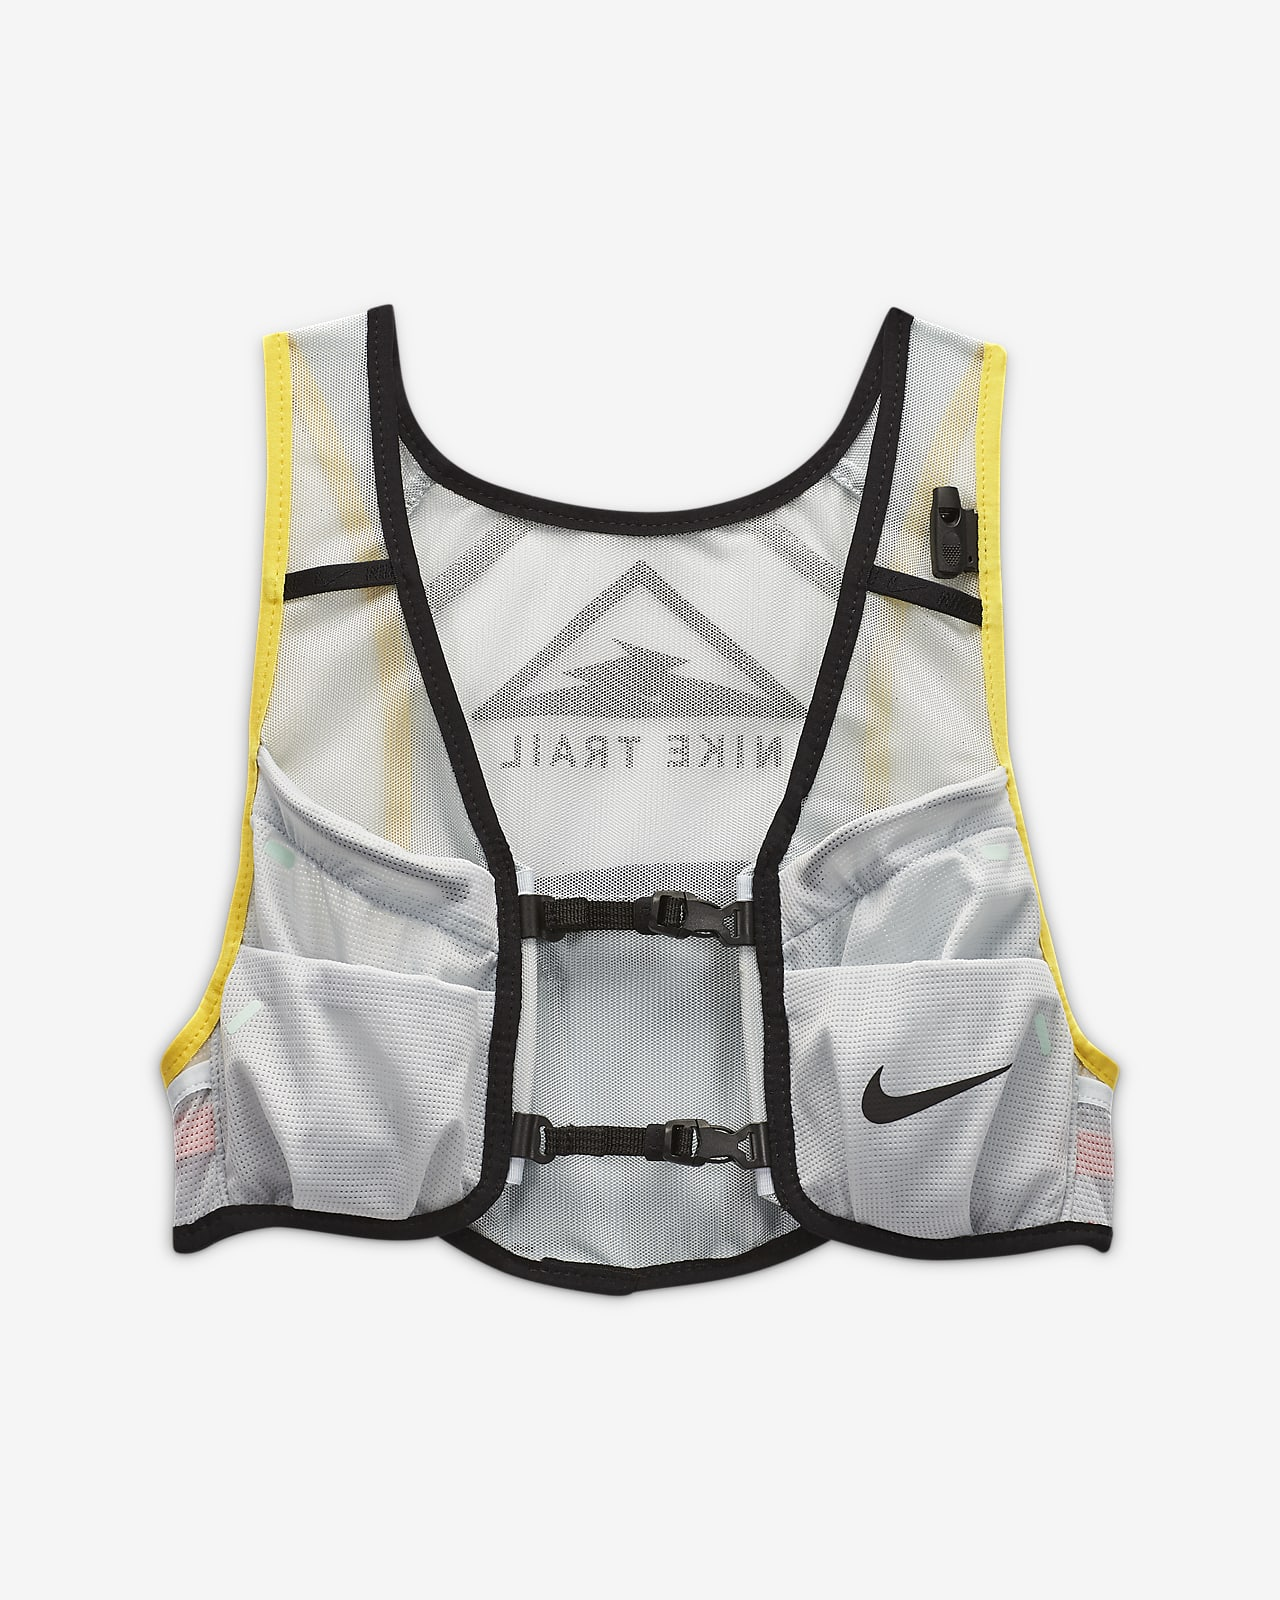 Nike Women's Running Trail Gilet